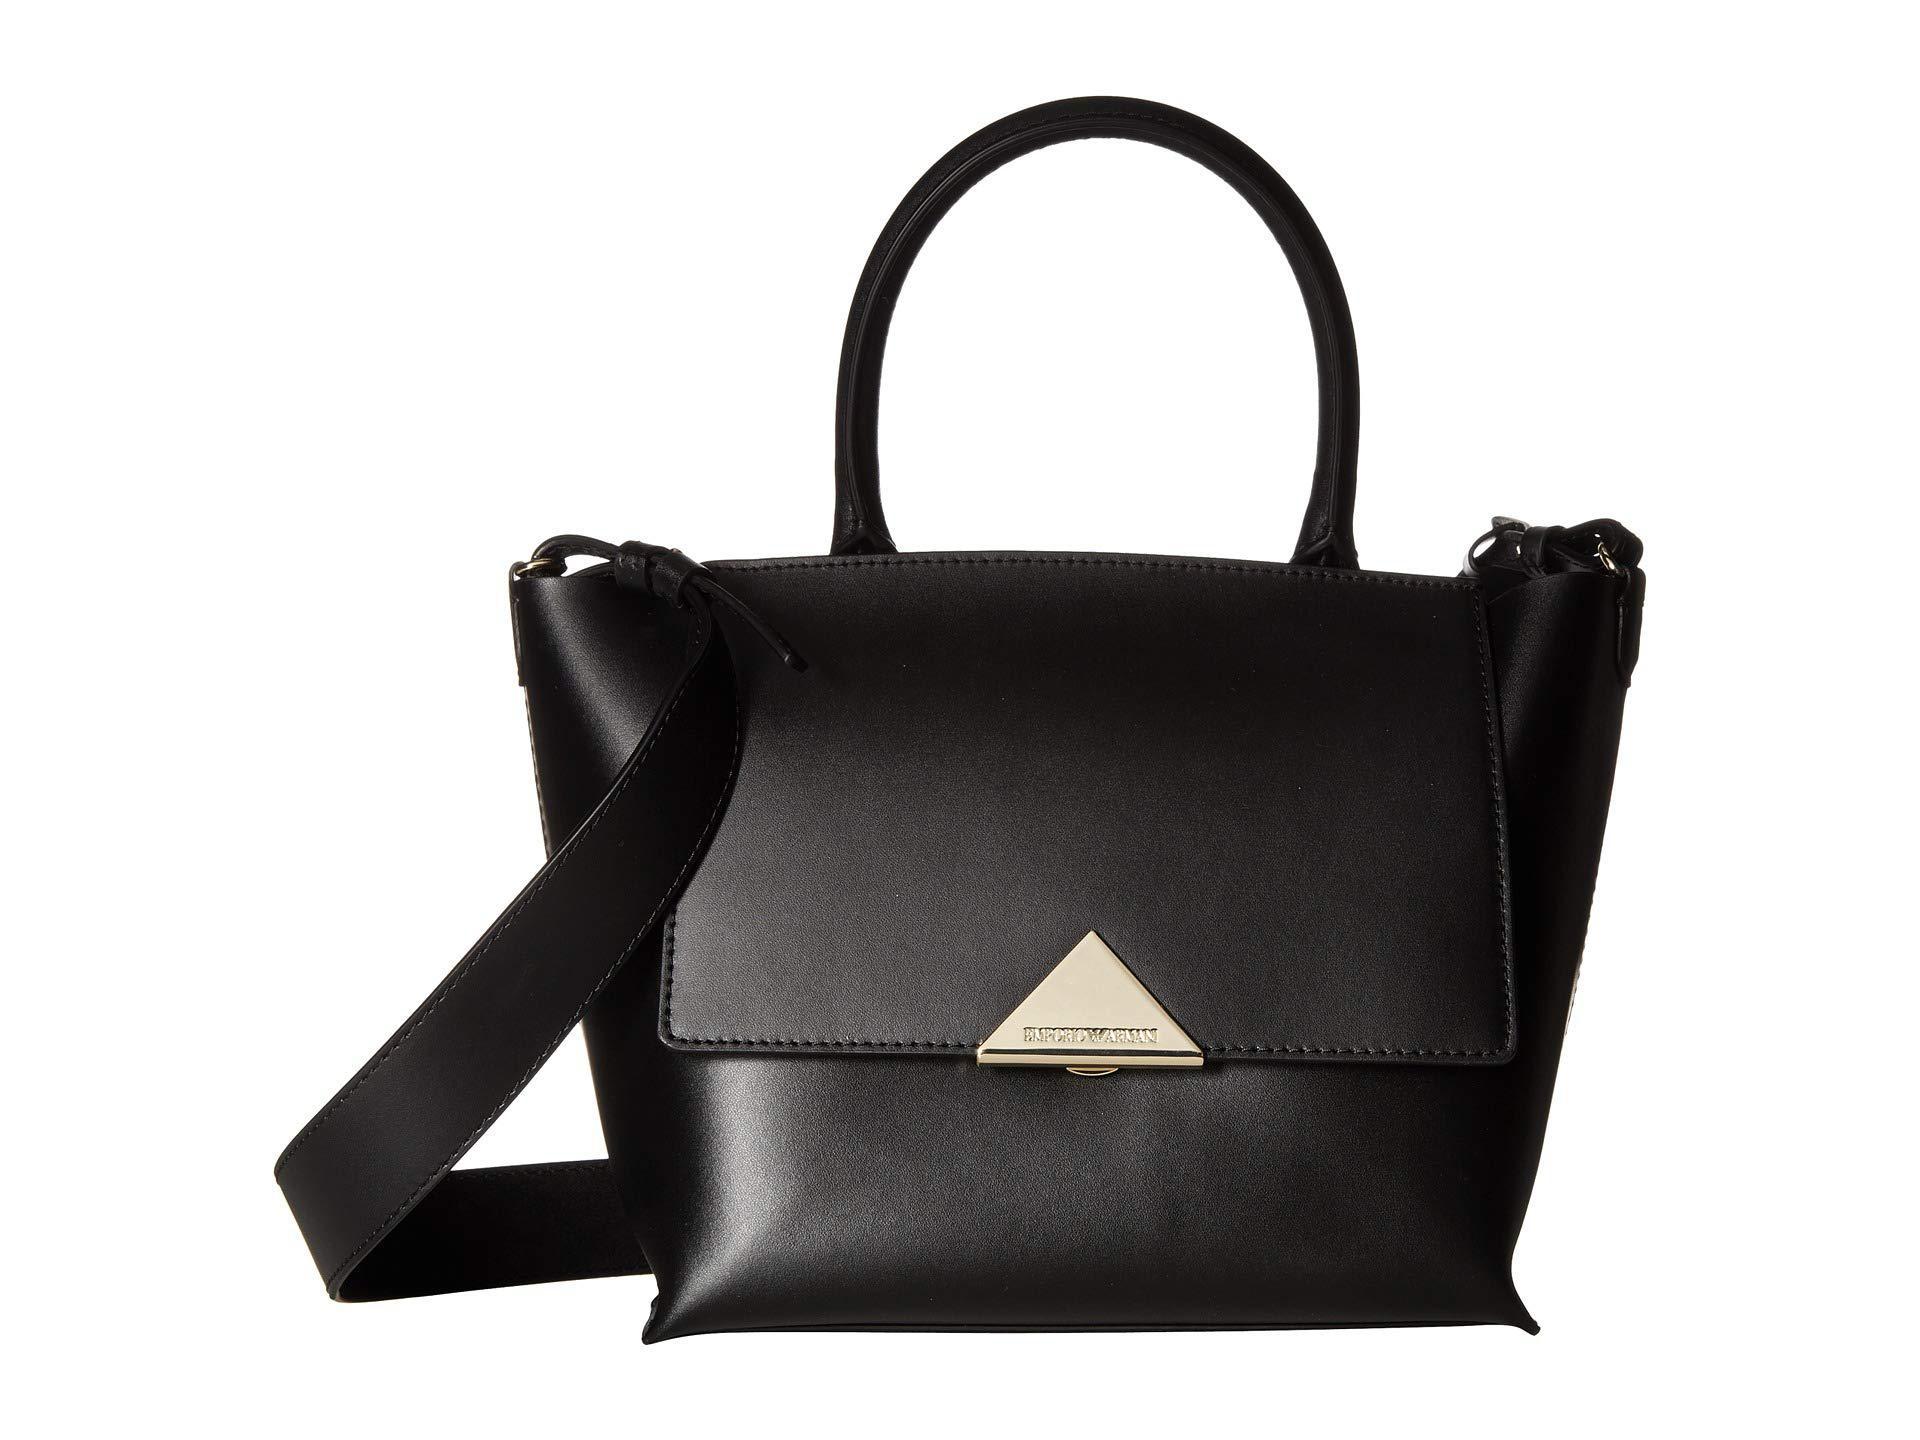 8e255563cd3c Lyst - Emporio Armani Faux Leather Handbag (black) Handbags in Black